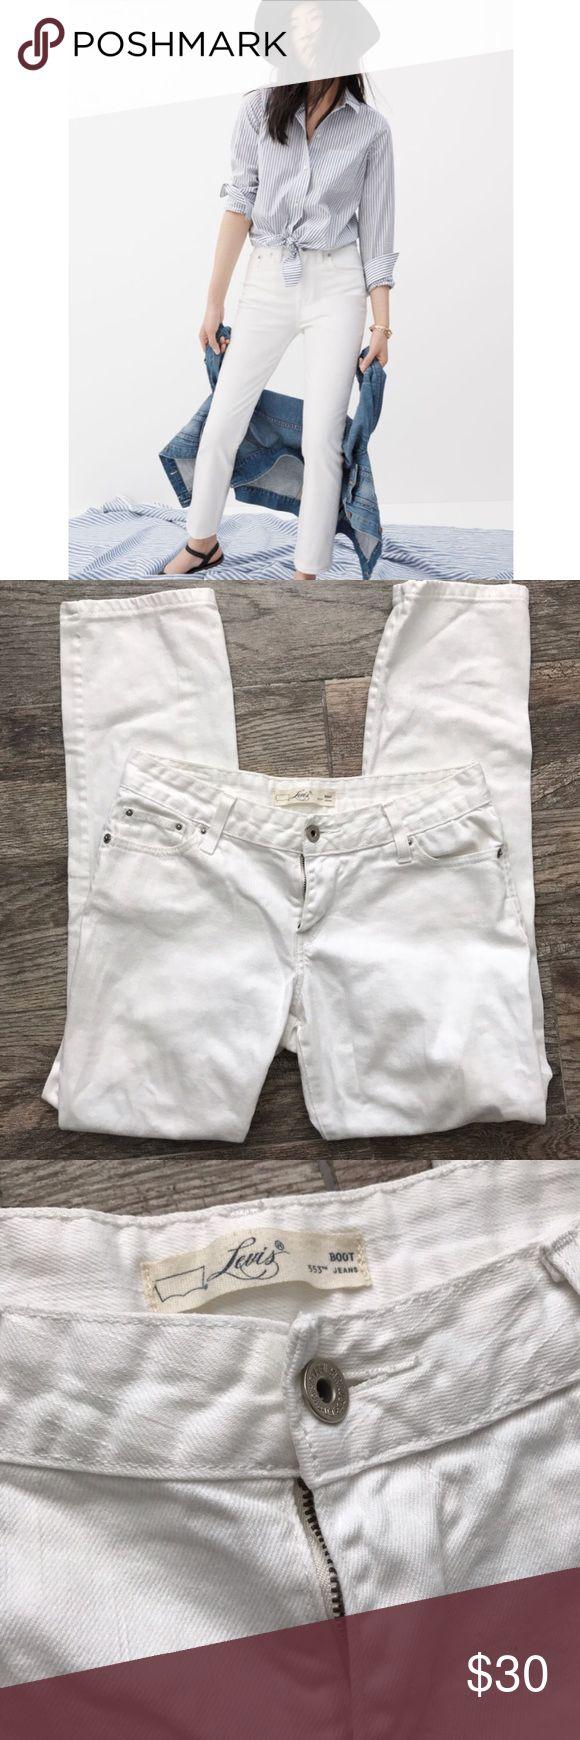 "Levi's 553 White Bootcut Jeans Levi's 553 White Bootcut Jeans - 99% cotton, 1% elastane. Inseam 27"" long. Size 2 Levi's Jeans Boot Cut"